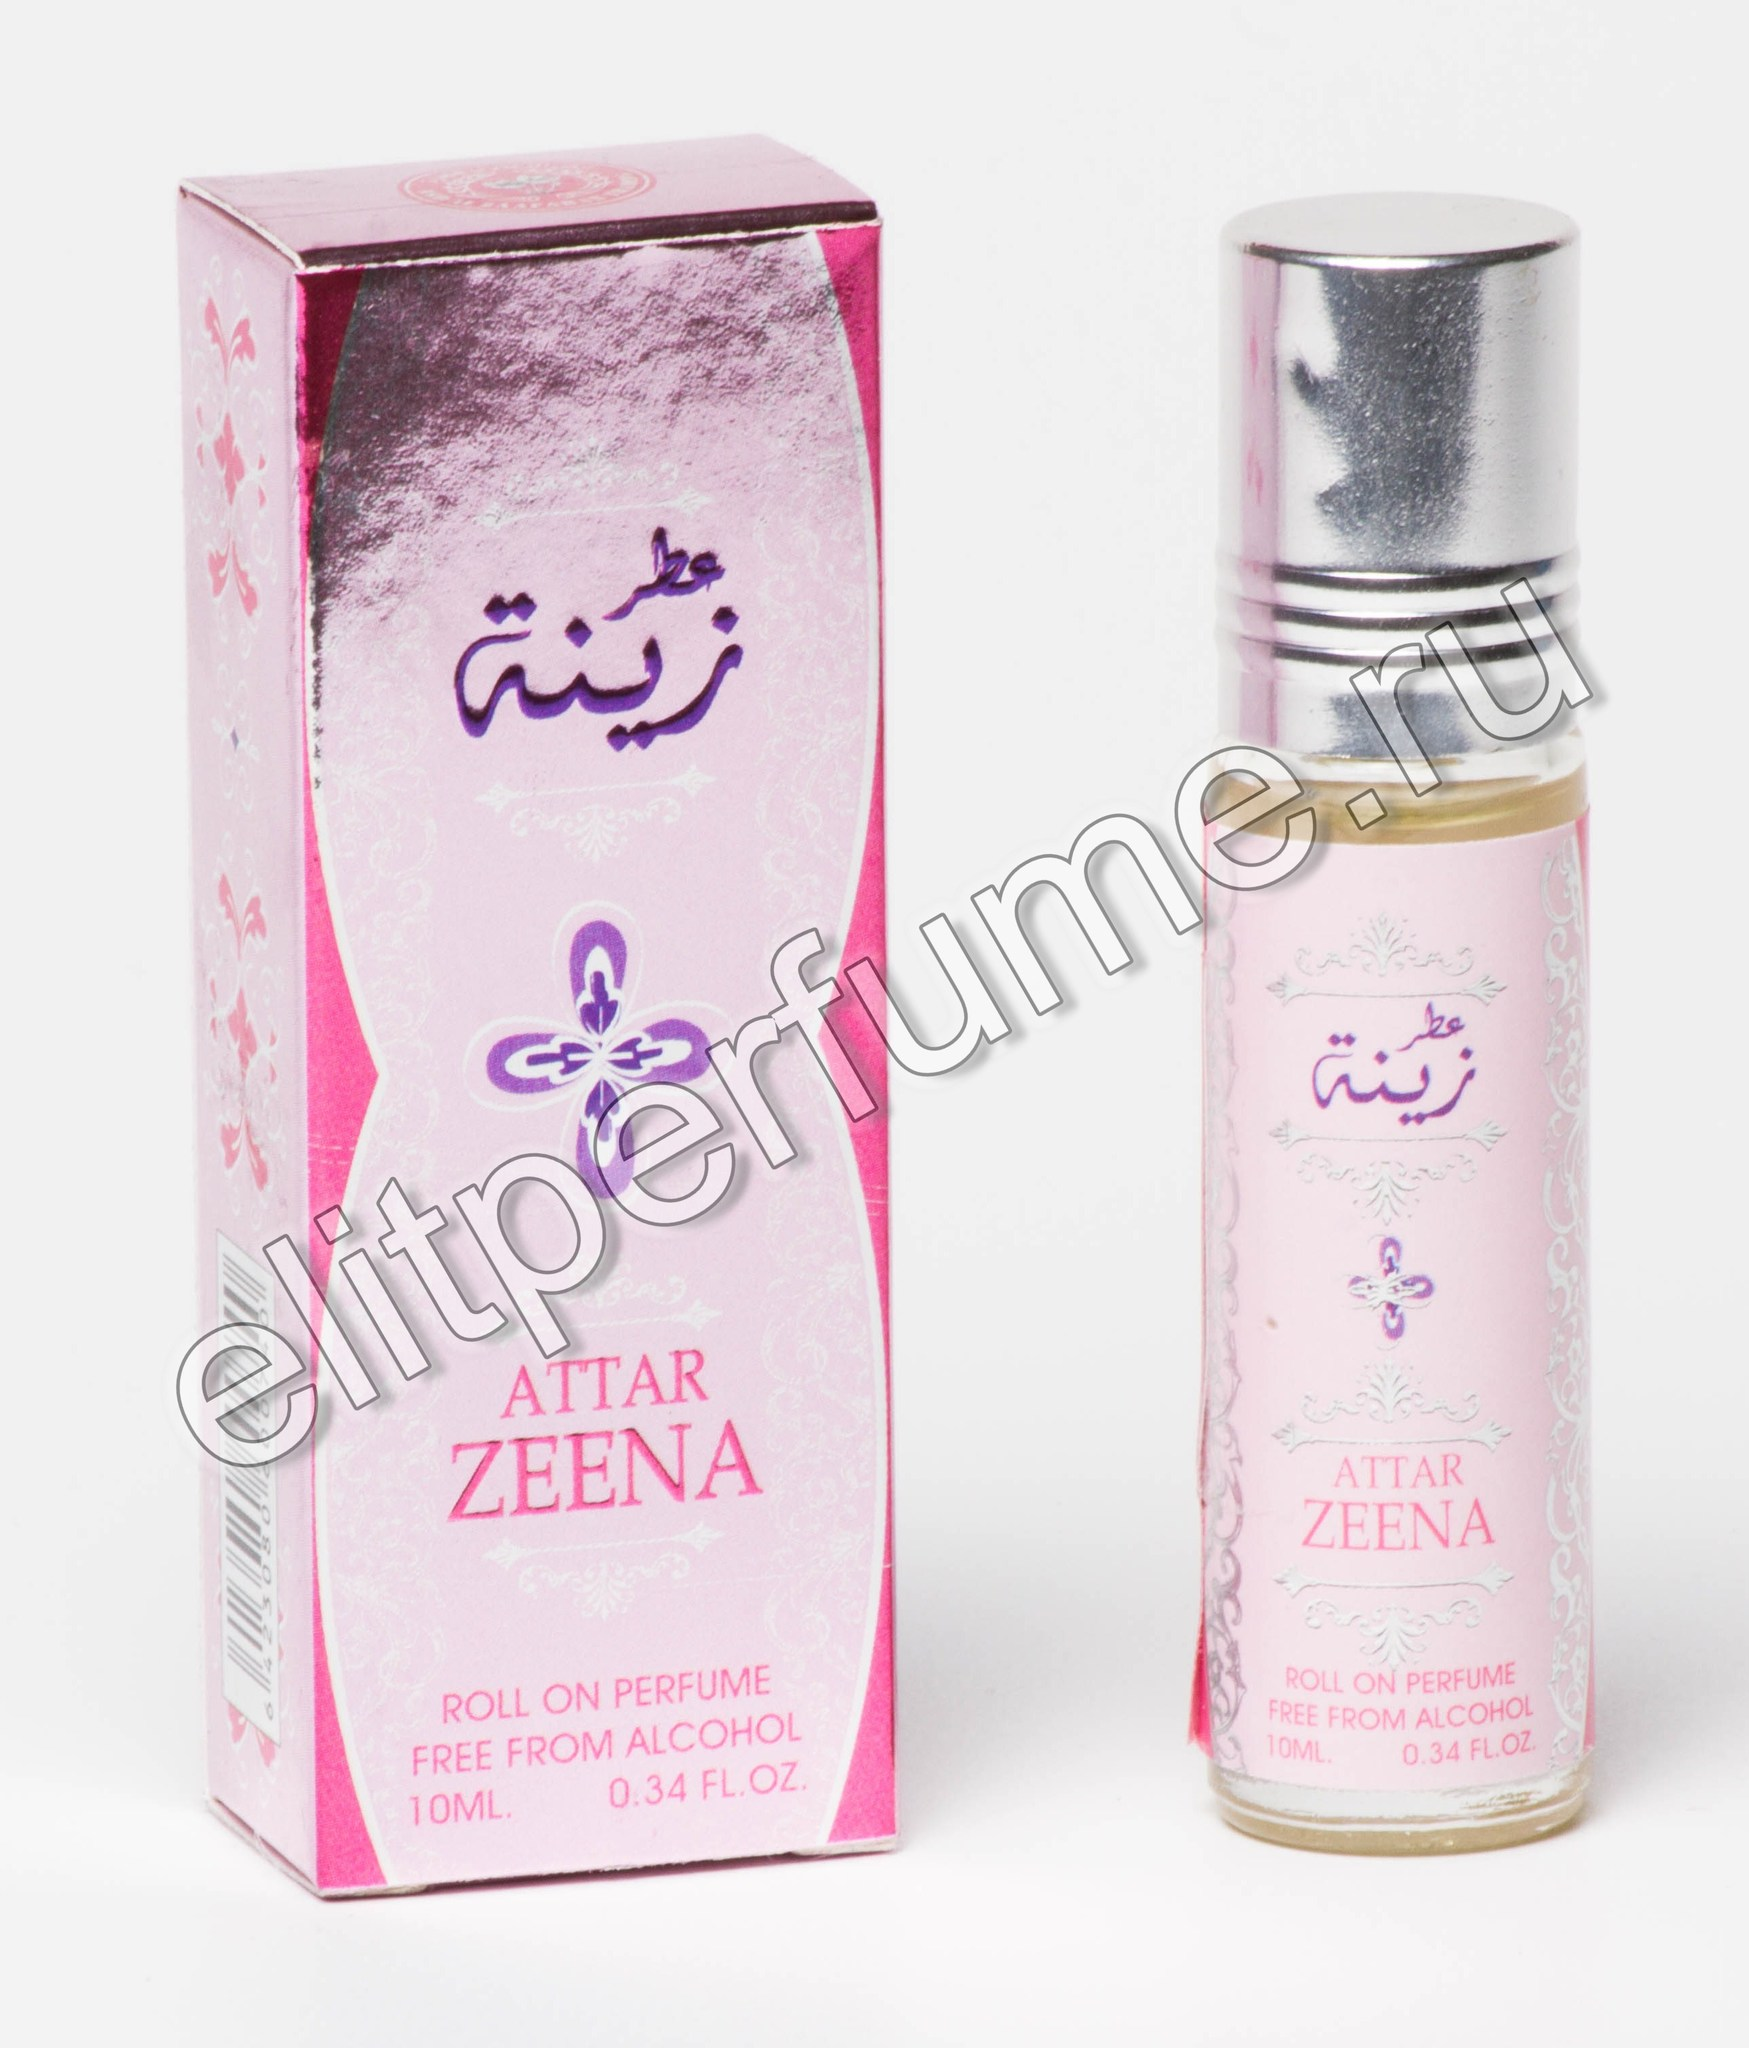 Attar Zeena Аттар Зеена 10 мл арабские масляные духи от Ард Аль Заафаран Ard Al Zaafaran